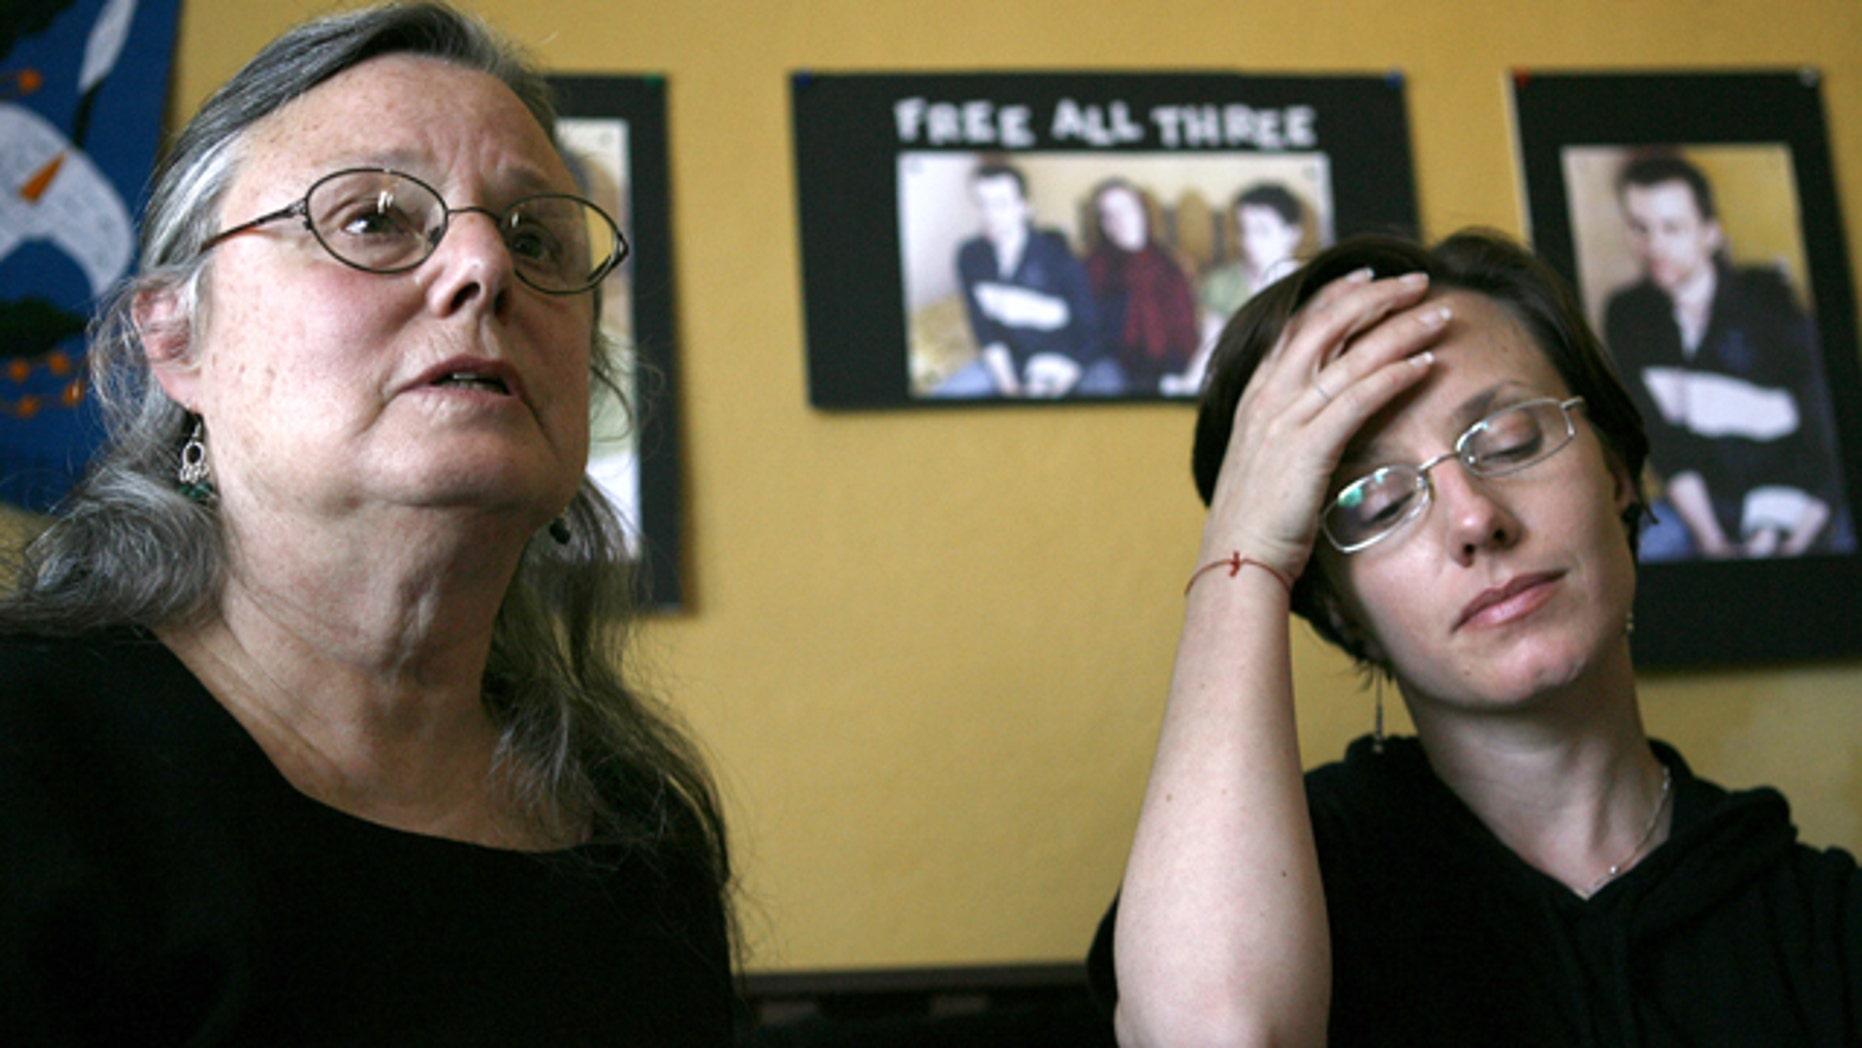 Oct. 9: Nora Shourd, left, along with her daughter, Sarah Shourd, speak to the media in Oakland, Calif.